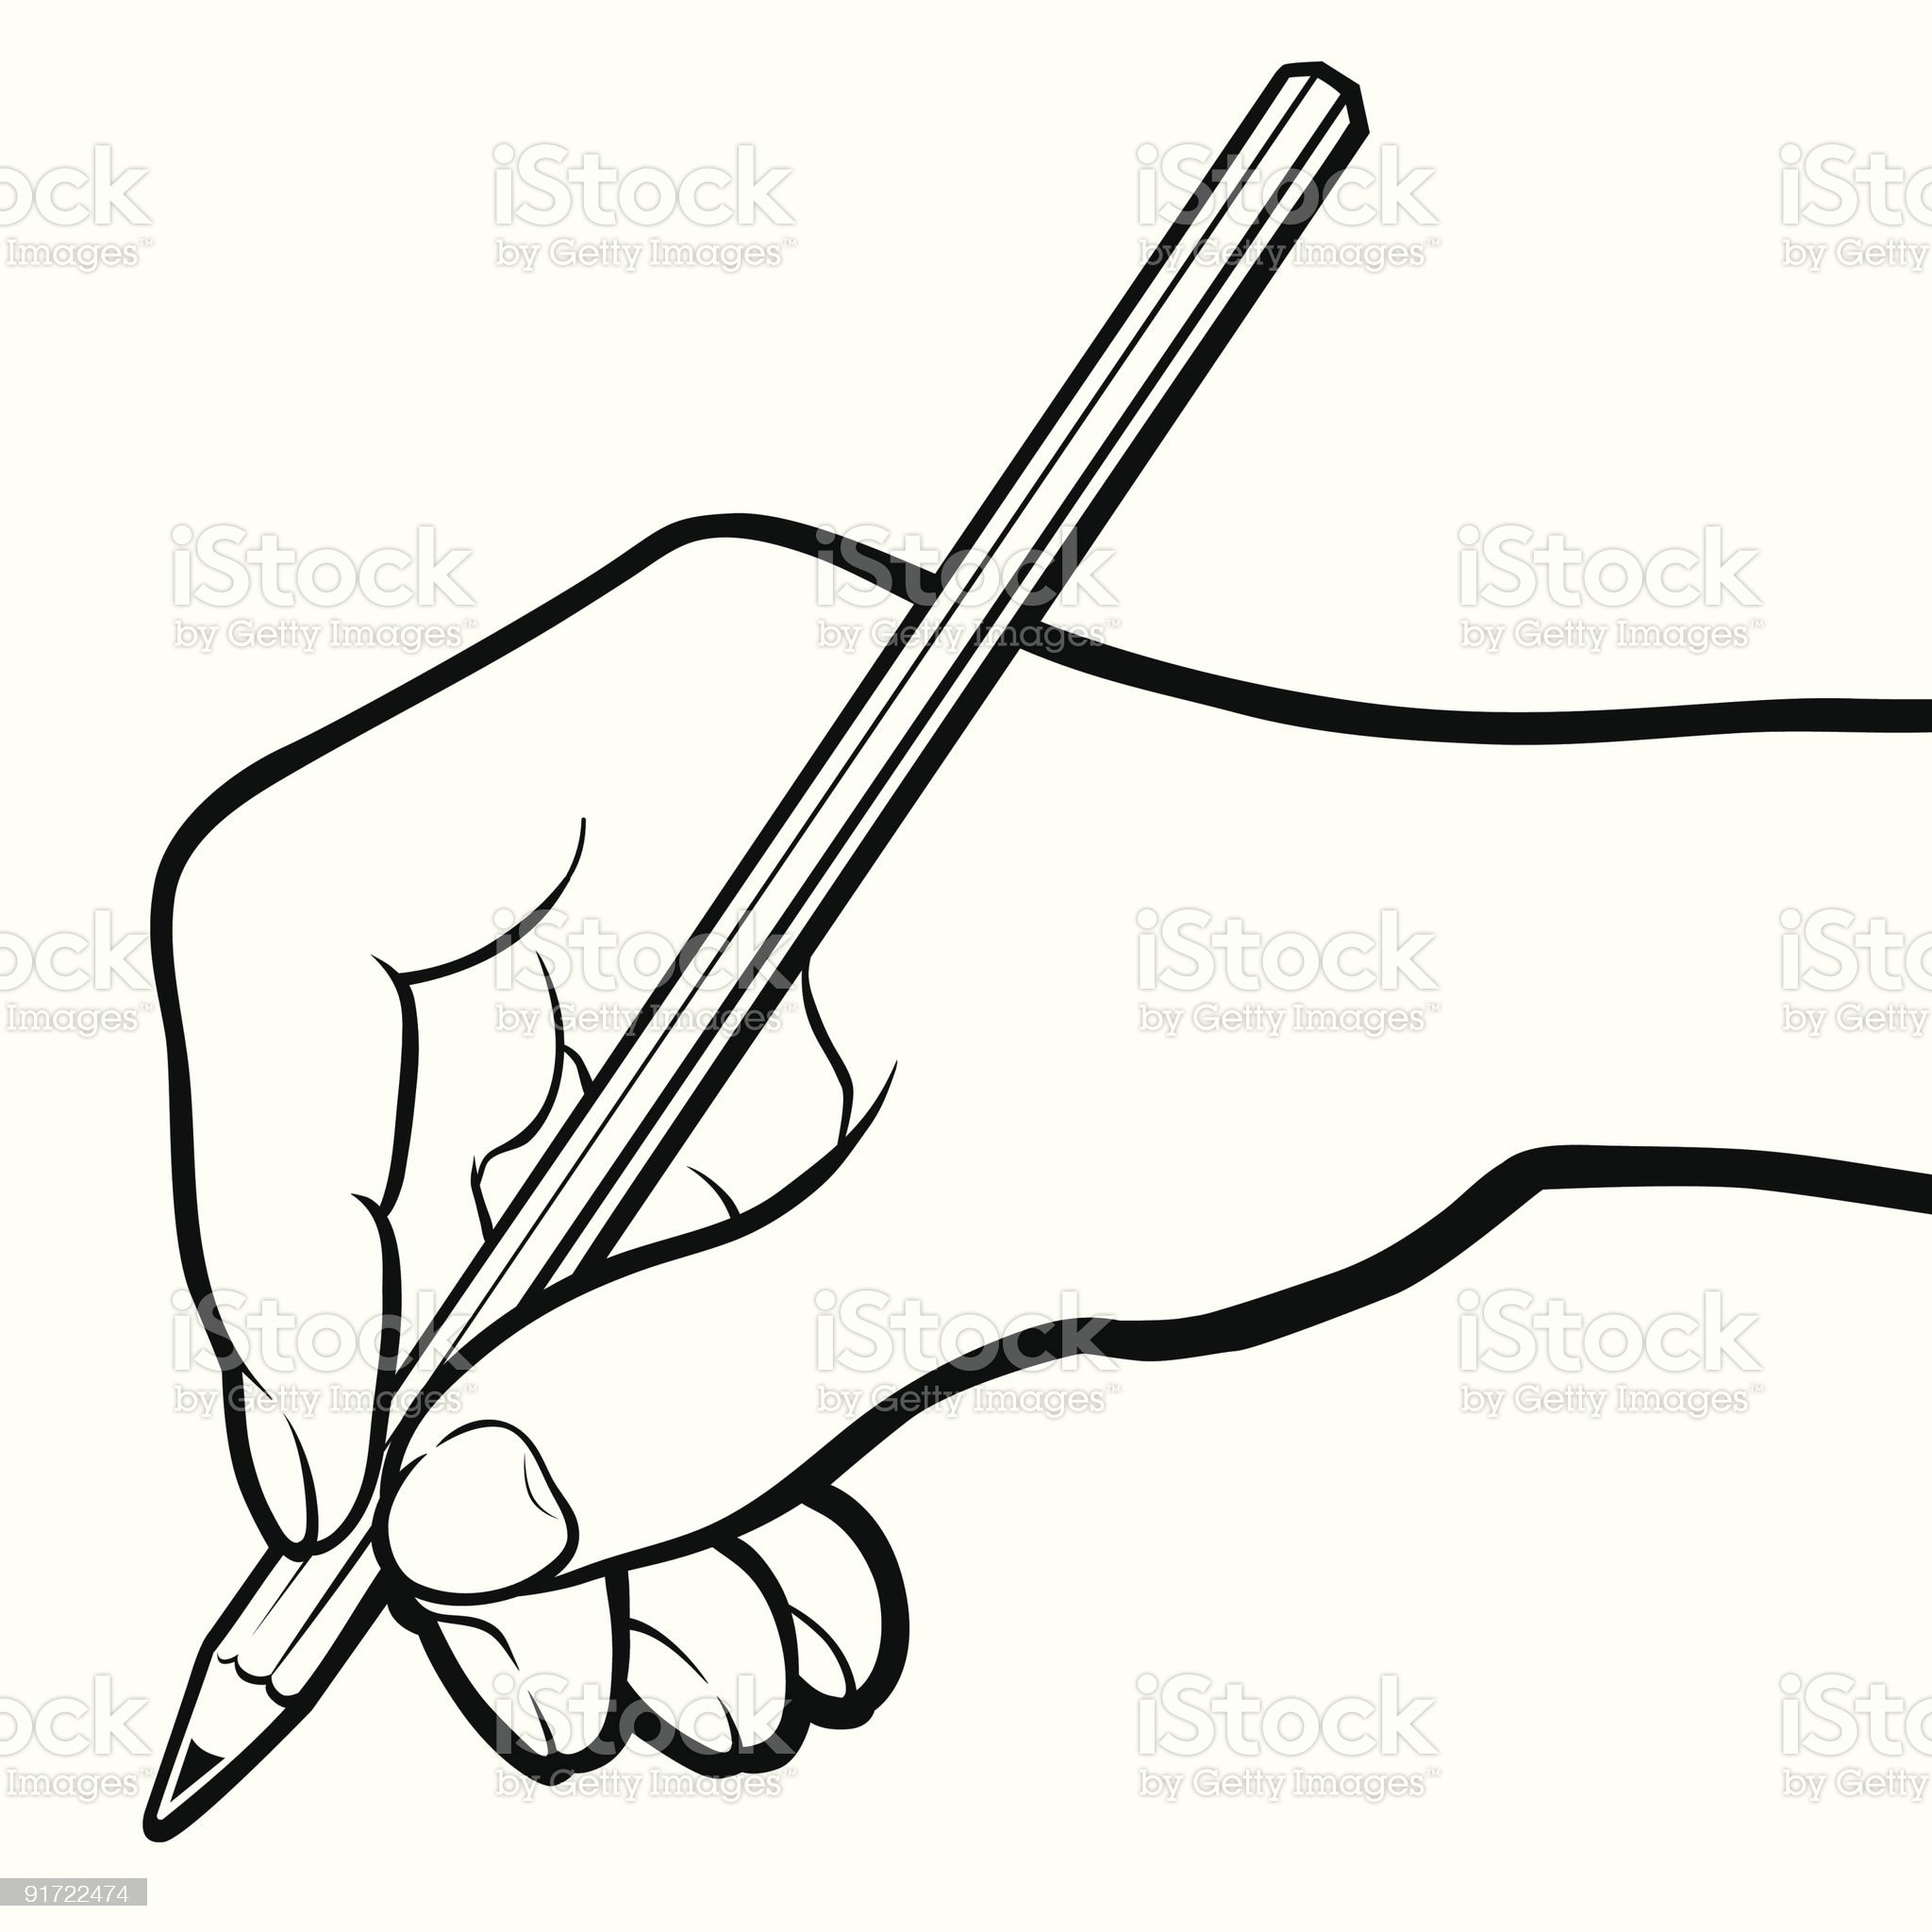 Hand royalty-free stock vector art